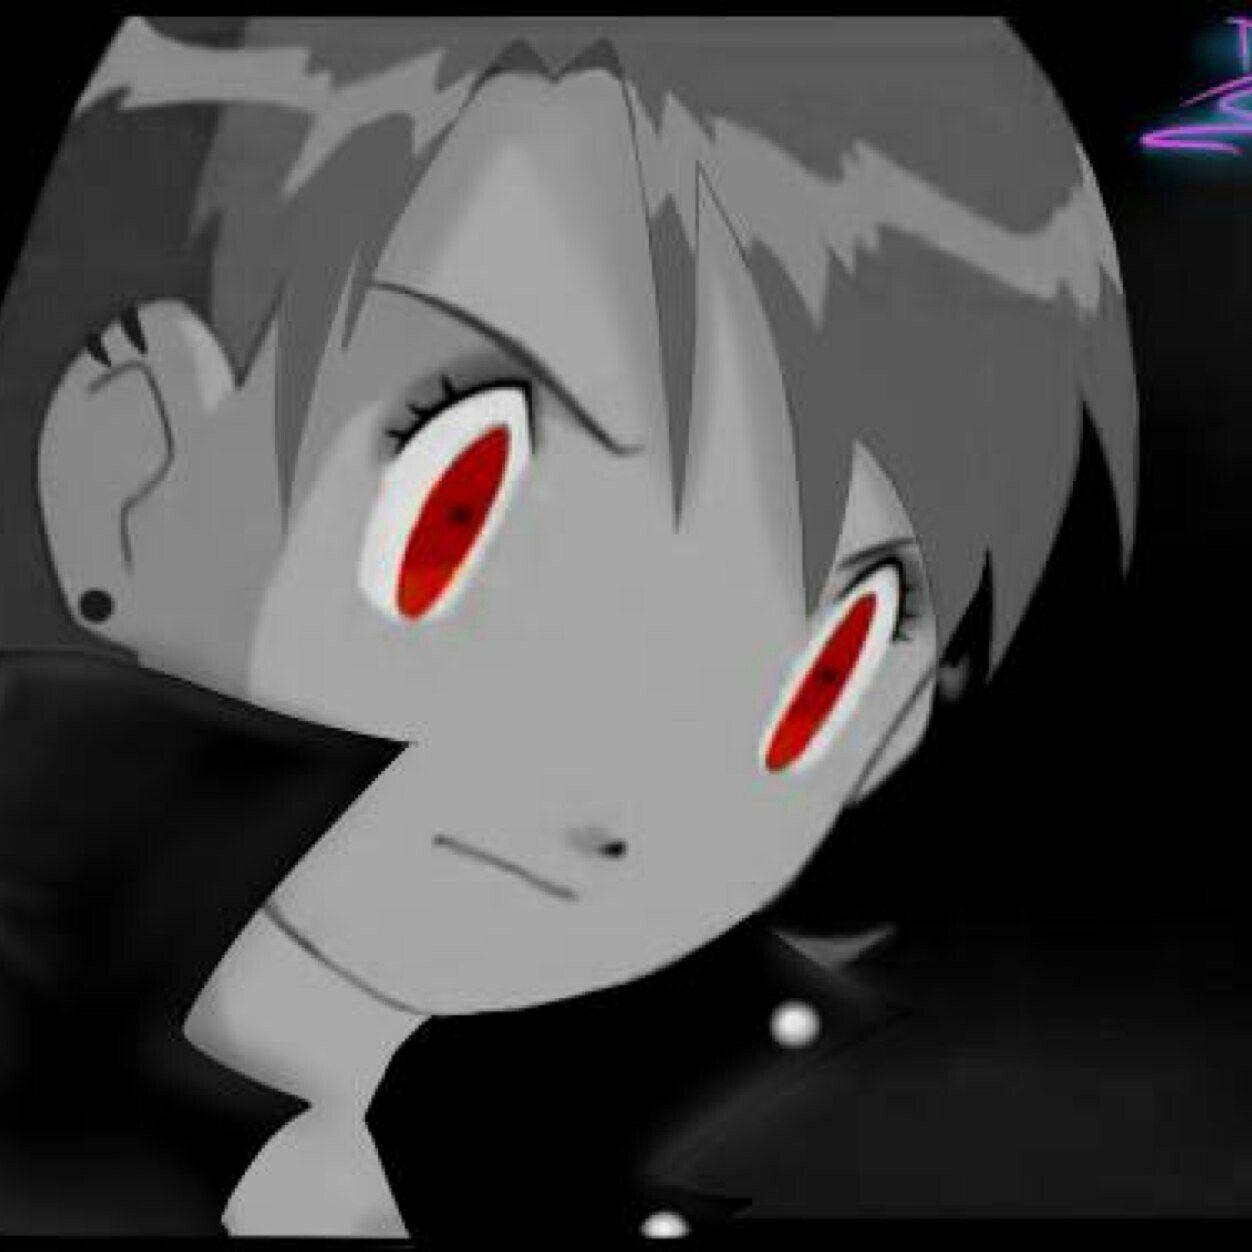 Darksora soratakenouchi evilclones creepypasta evil clones